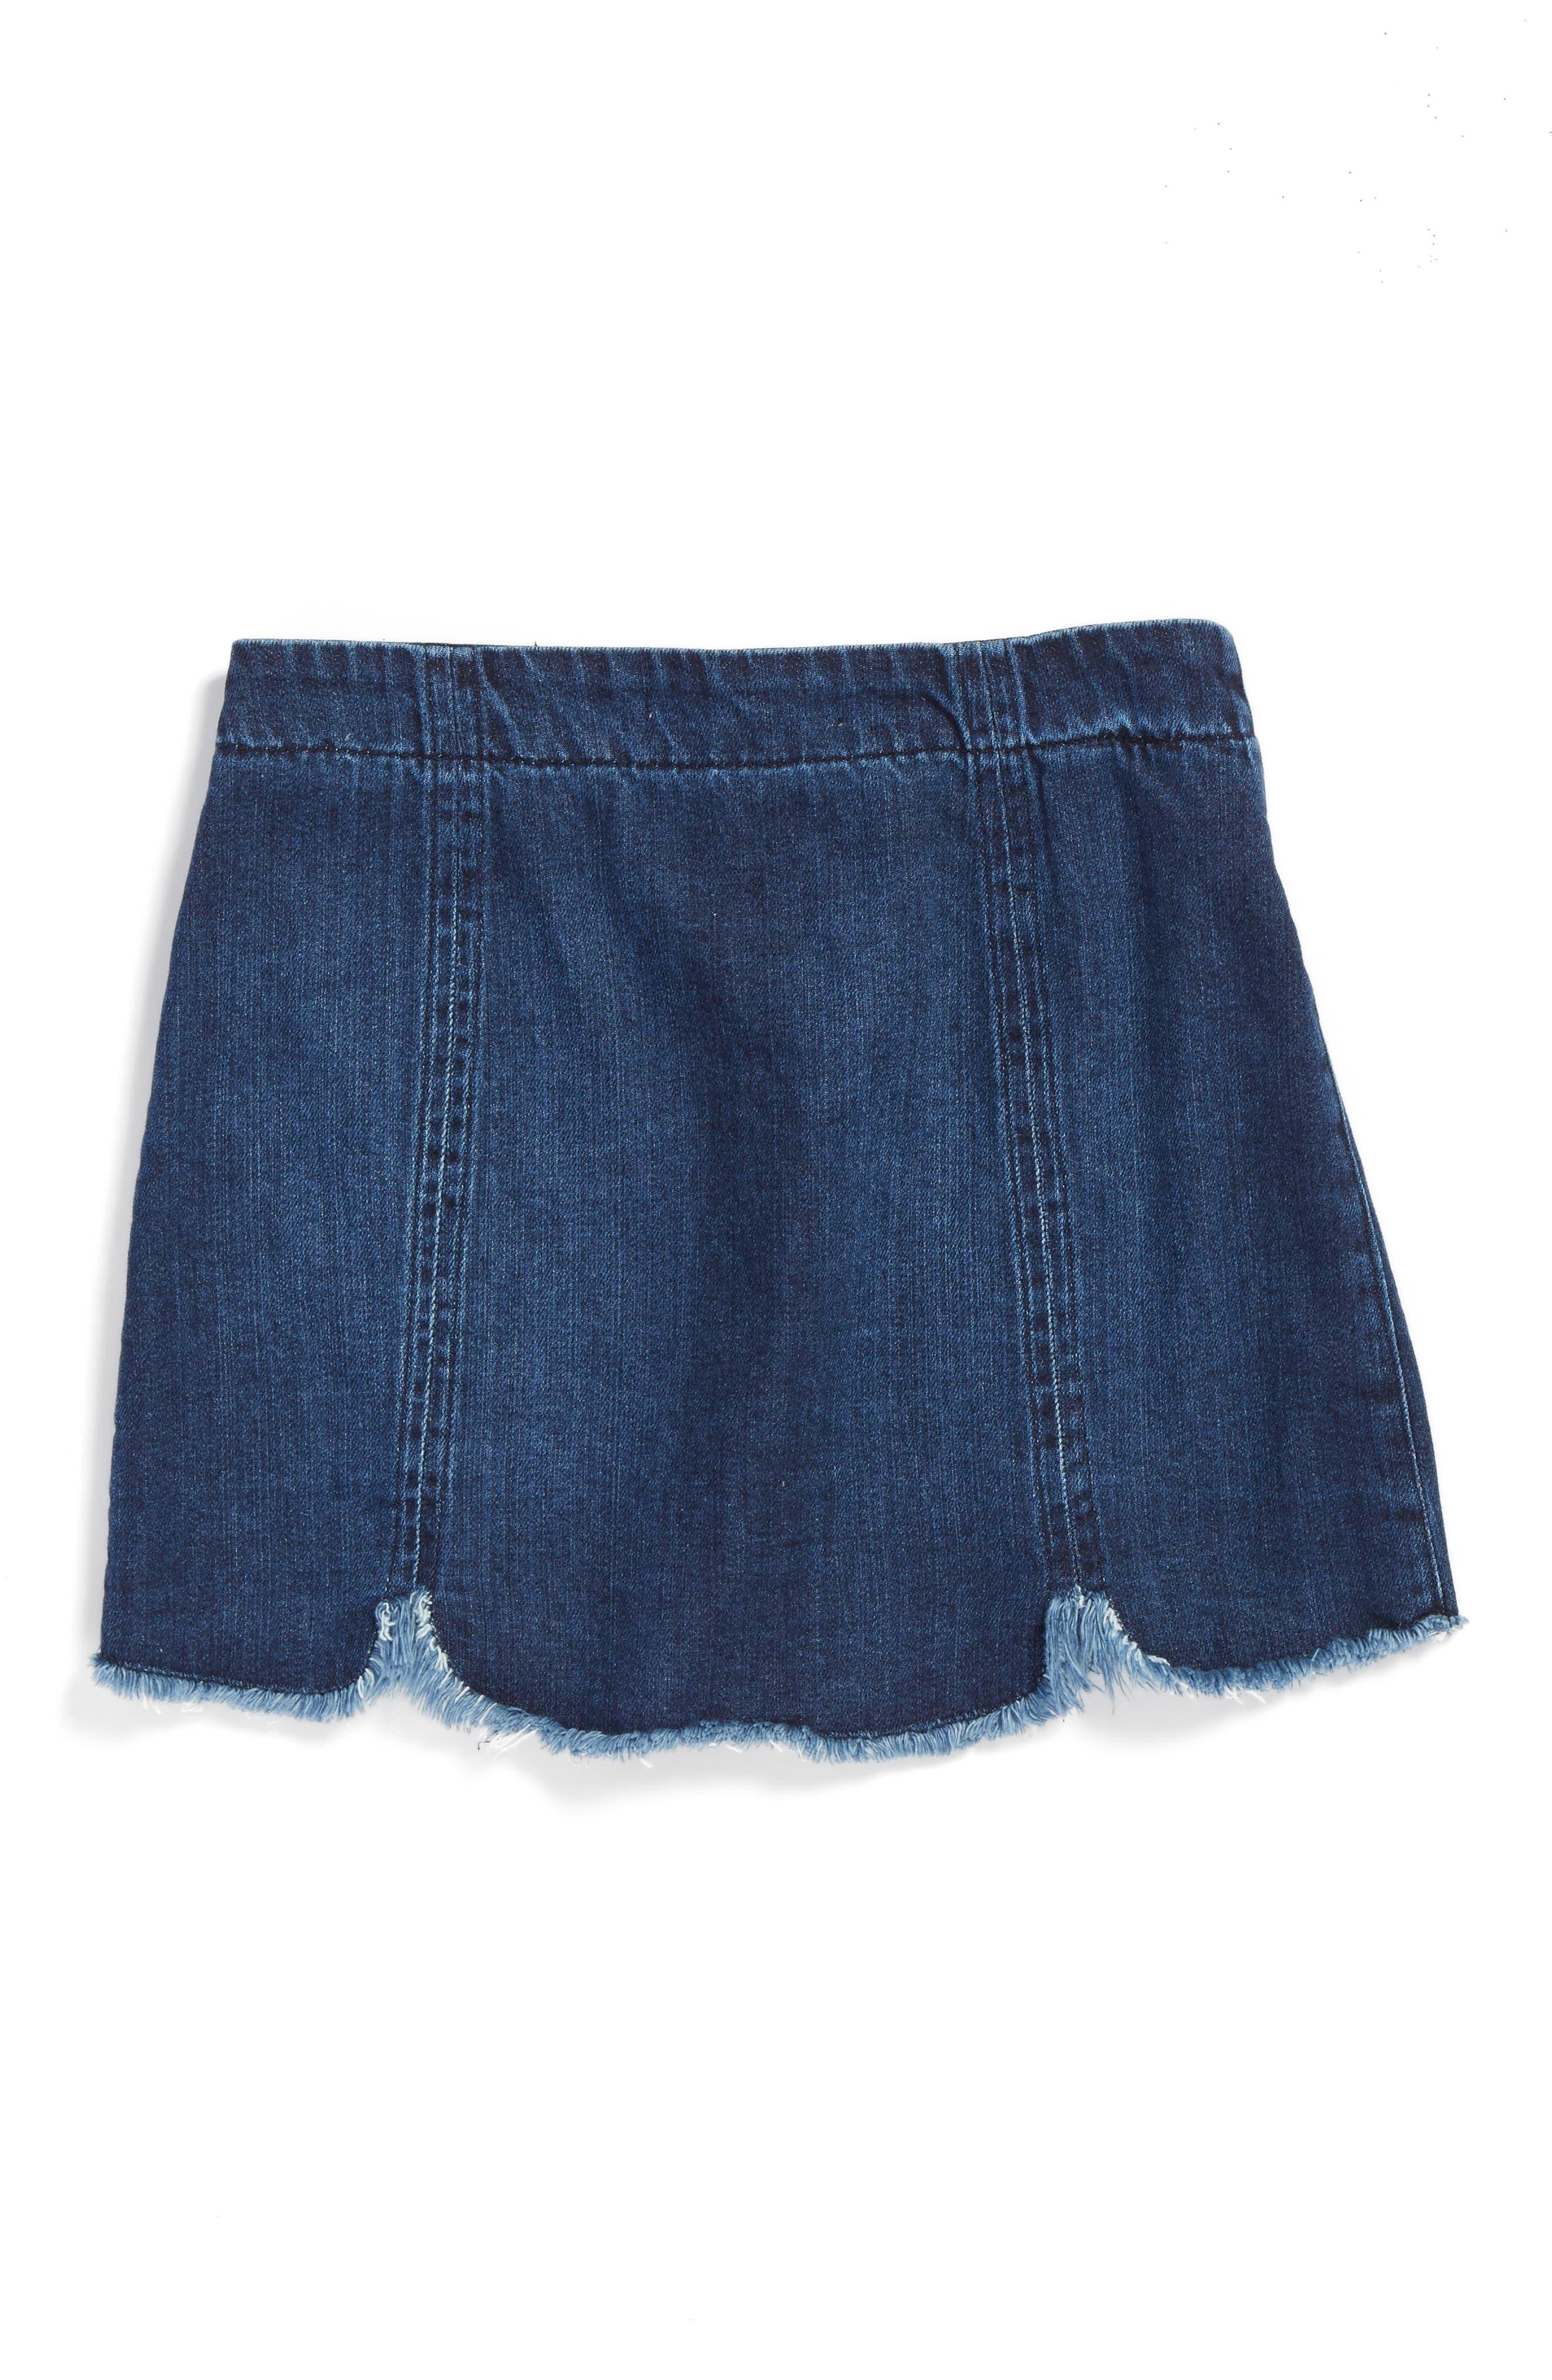 Frayed Scallop Denim Skirt,                             Alternate thumbnail 2, color,                             407